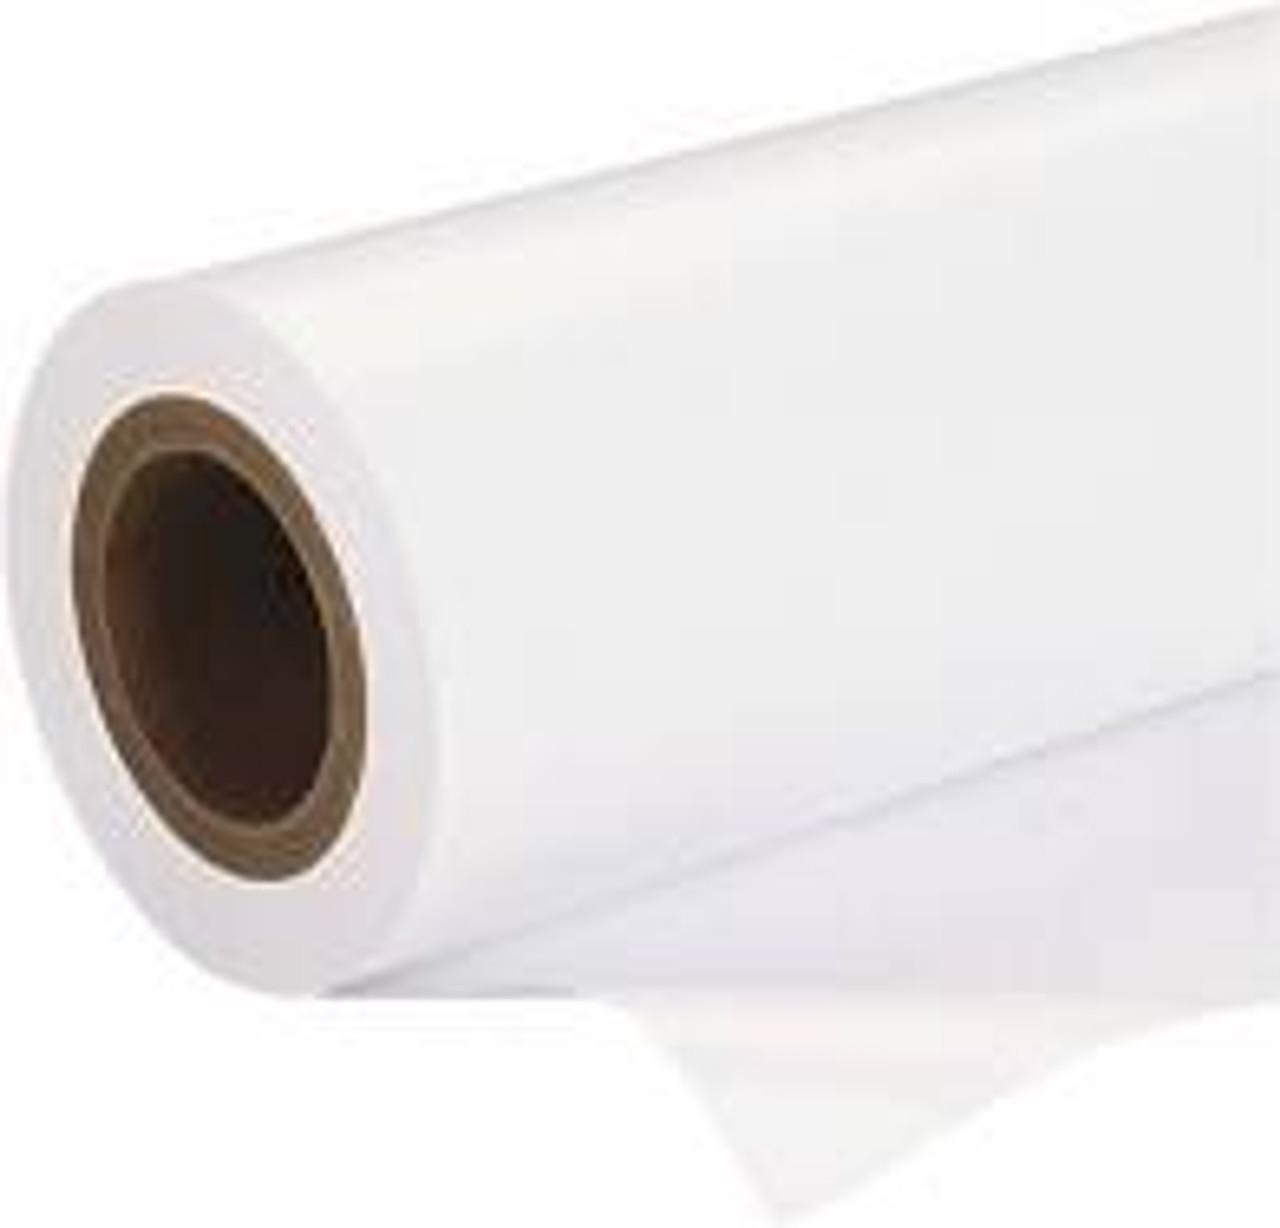 "Kapco 3 mil PSA Gloss  Calendered UV Vinyl Laminate 30""x 150' (KJSLAM/30 )"